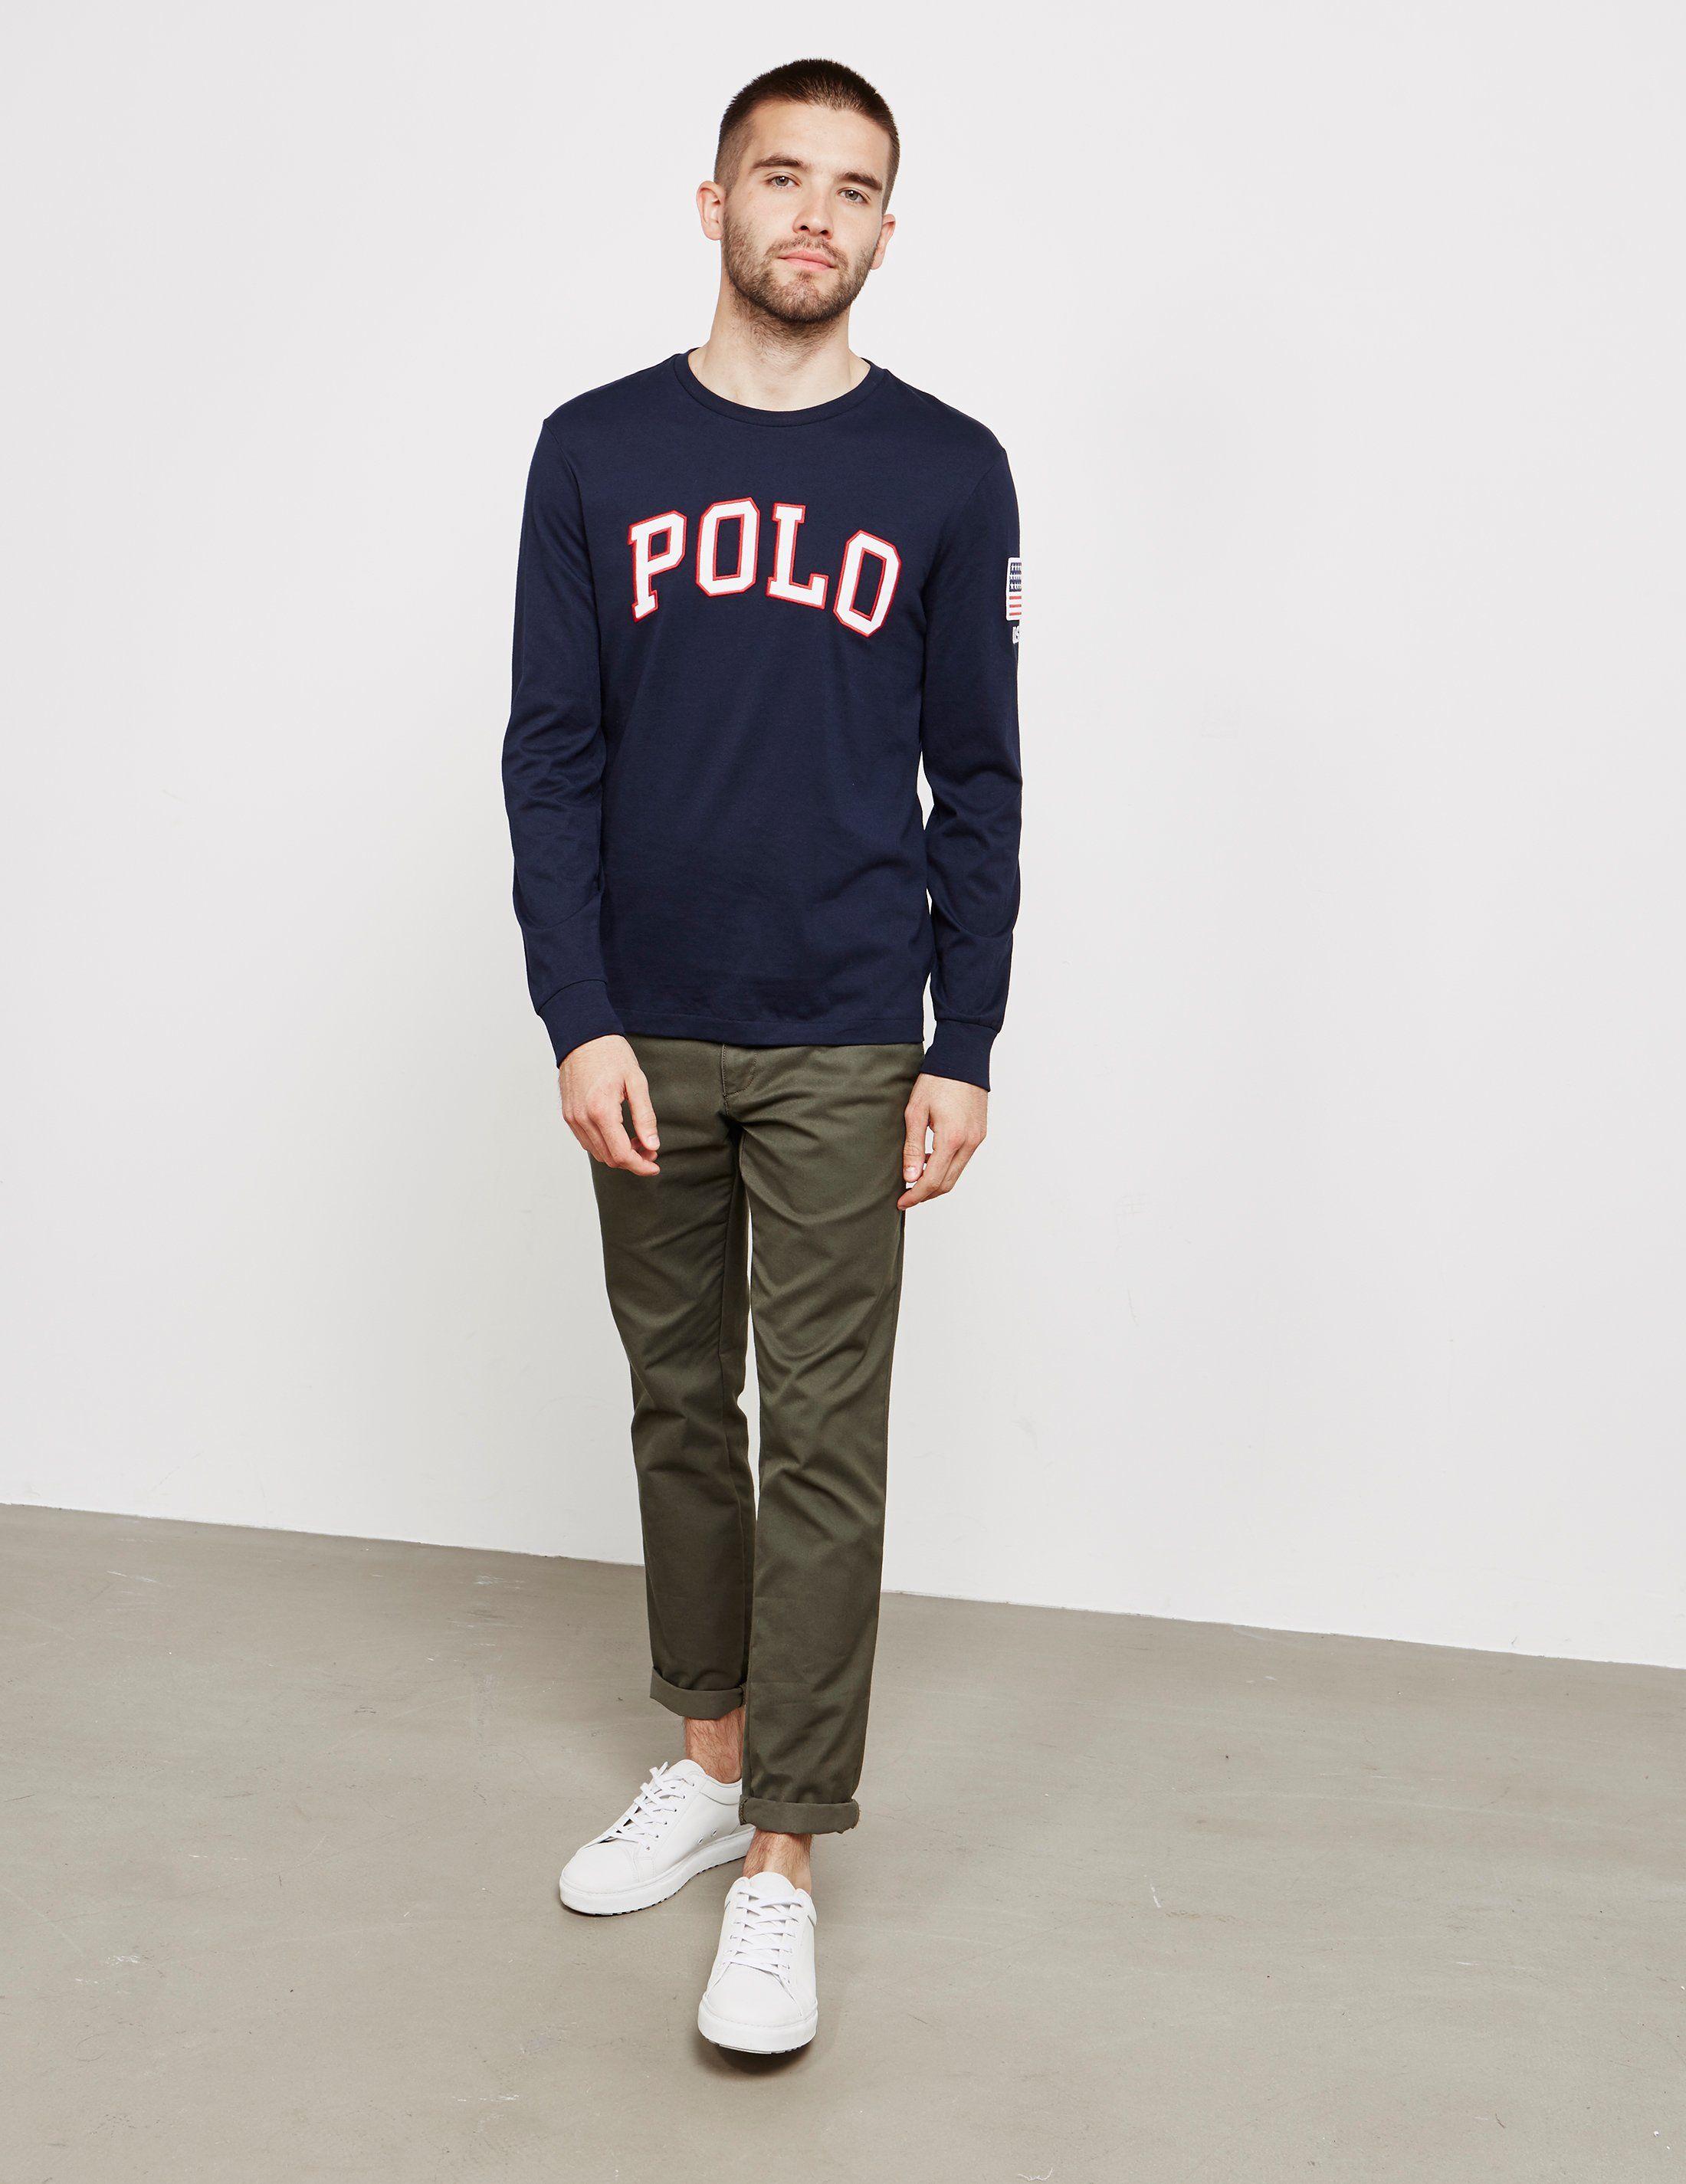 Polo Ralph Lauren Polo Long Sleeve T-Shirt